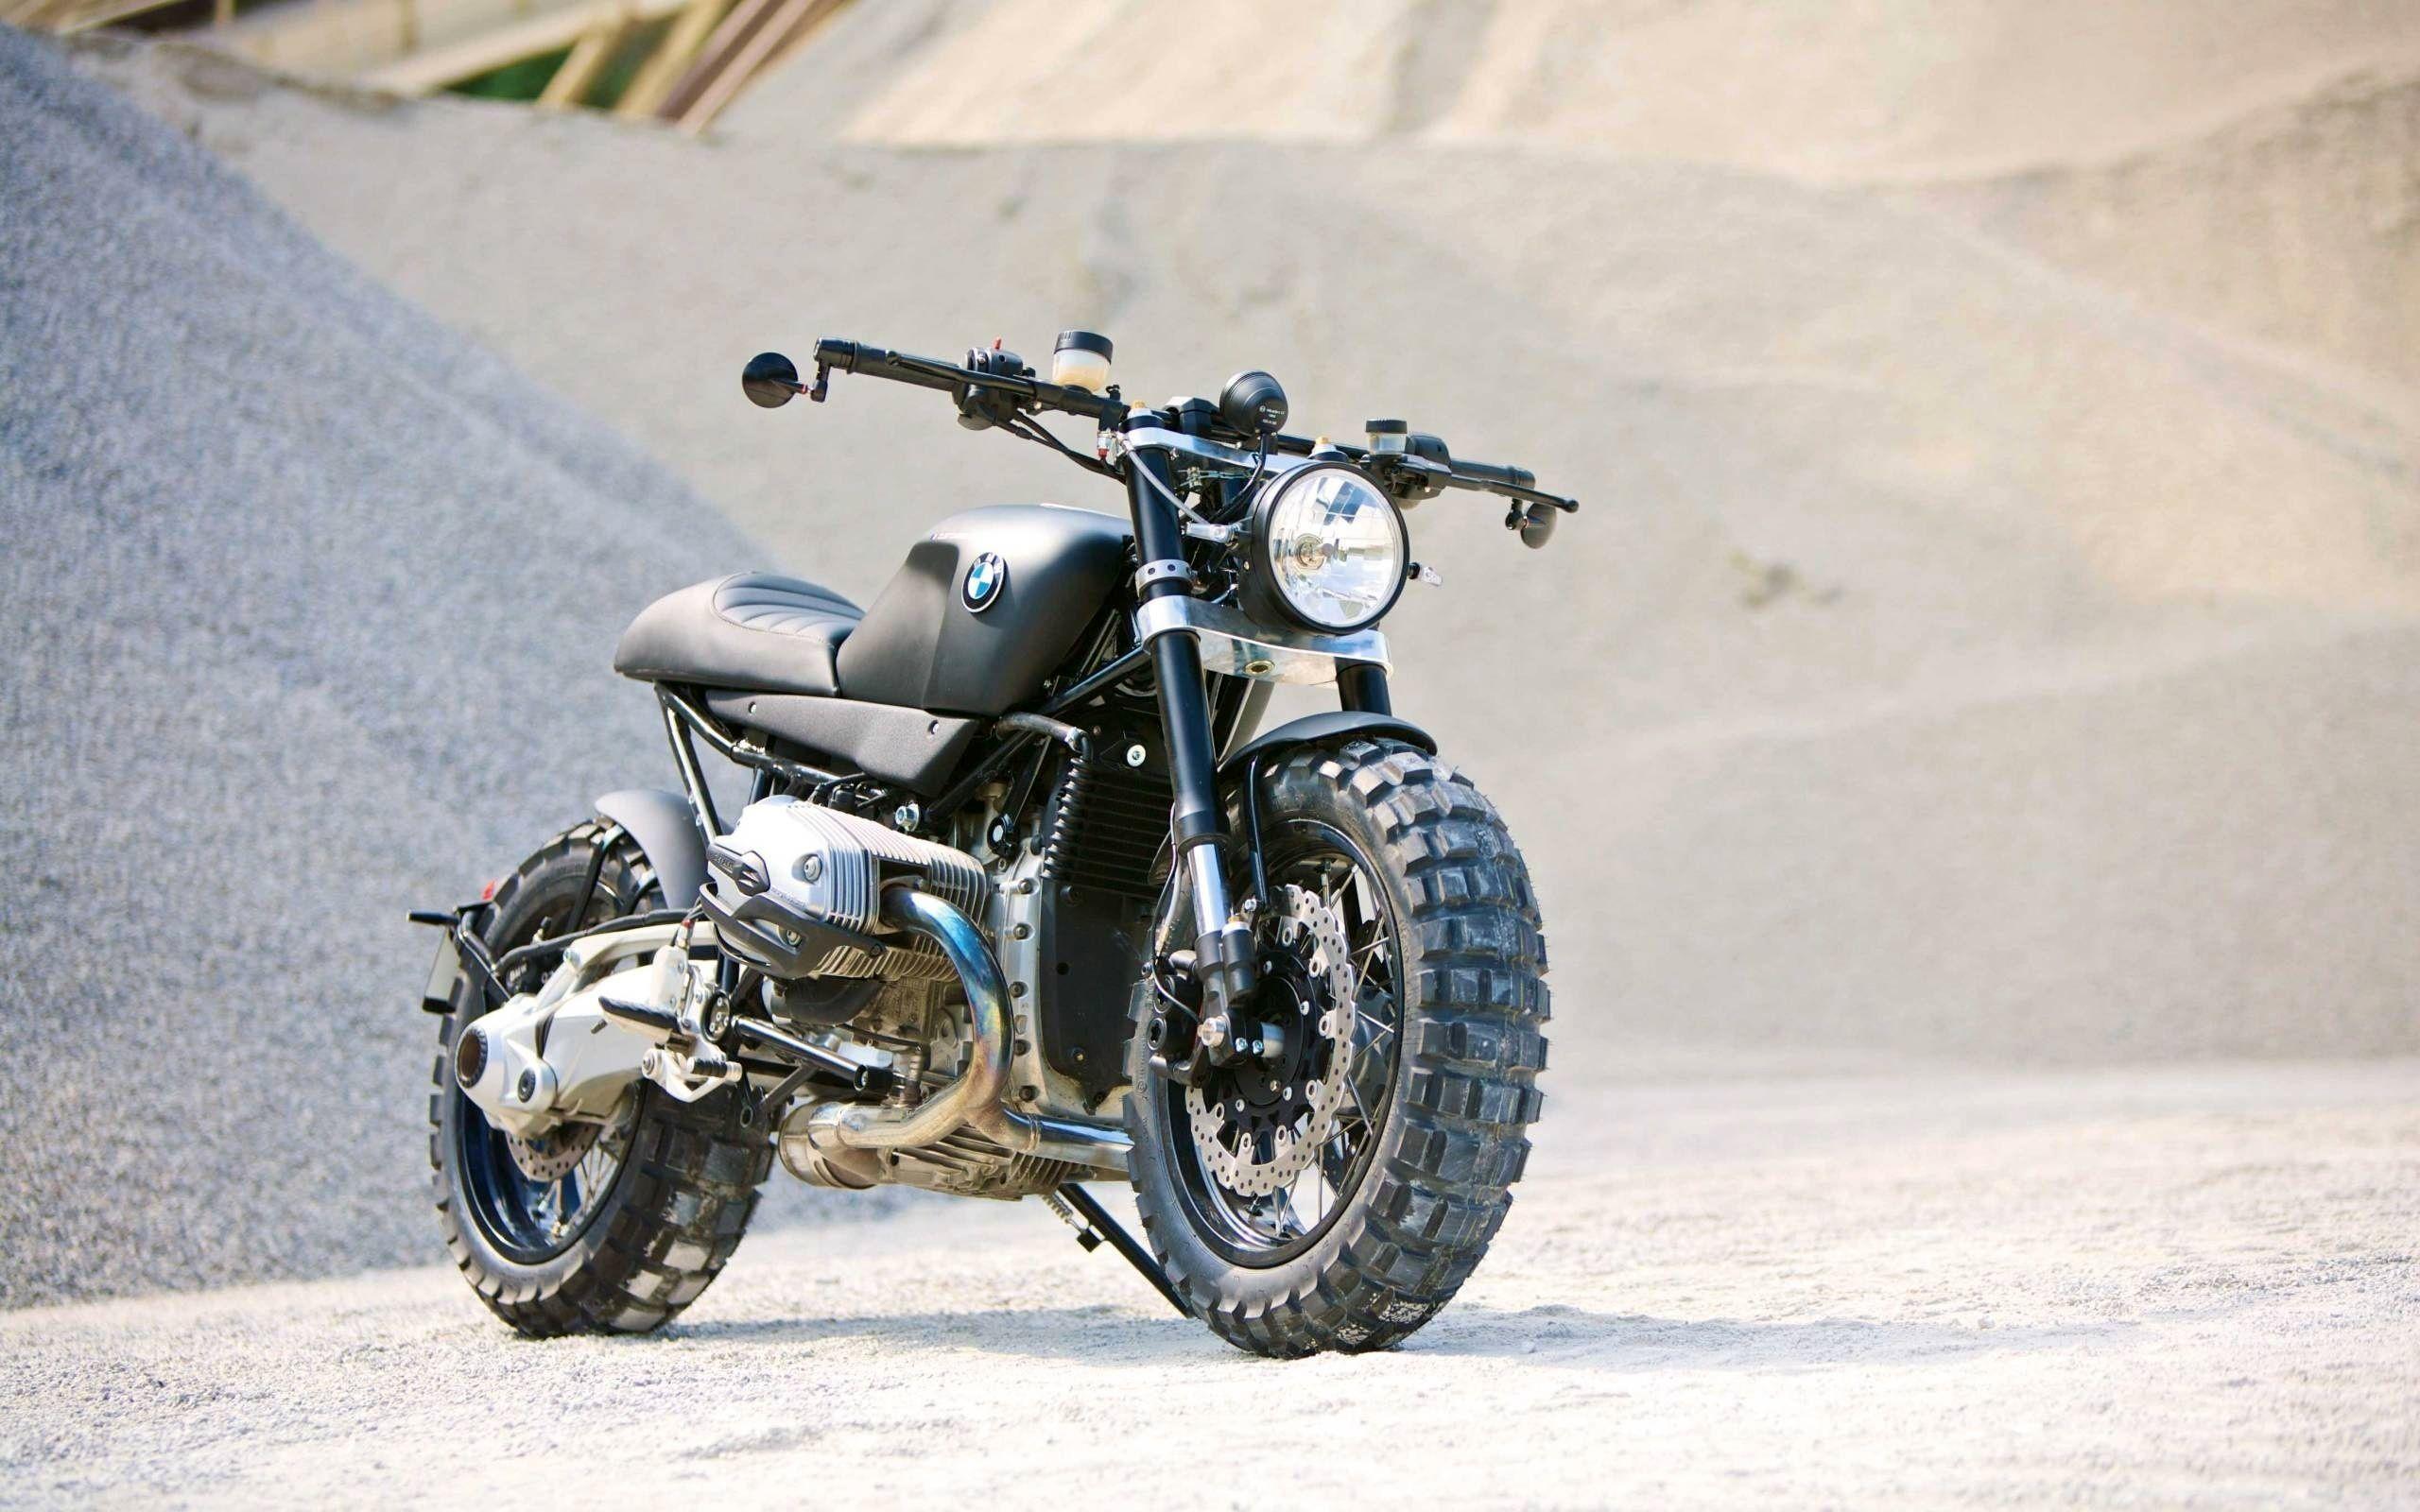 Motorcycle Bmw R1200r Scrambler Wallpaper Hd Desktop Wallpaper